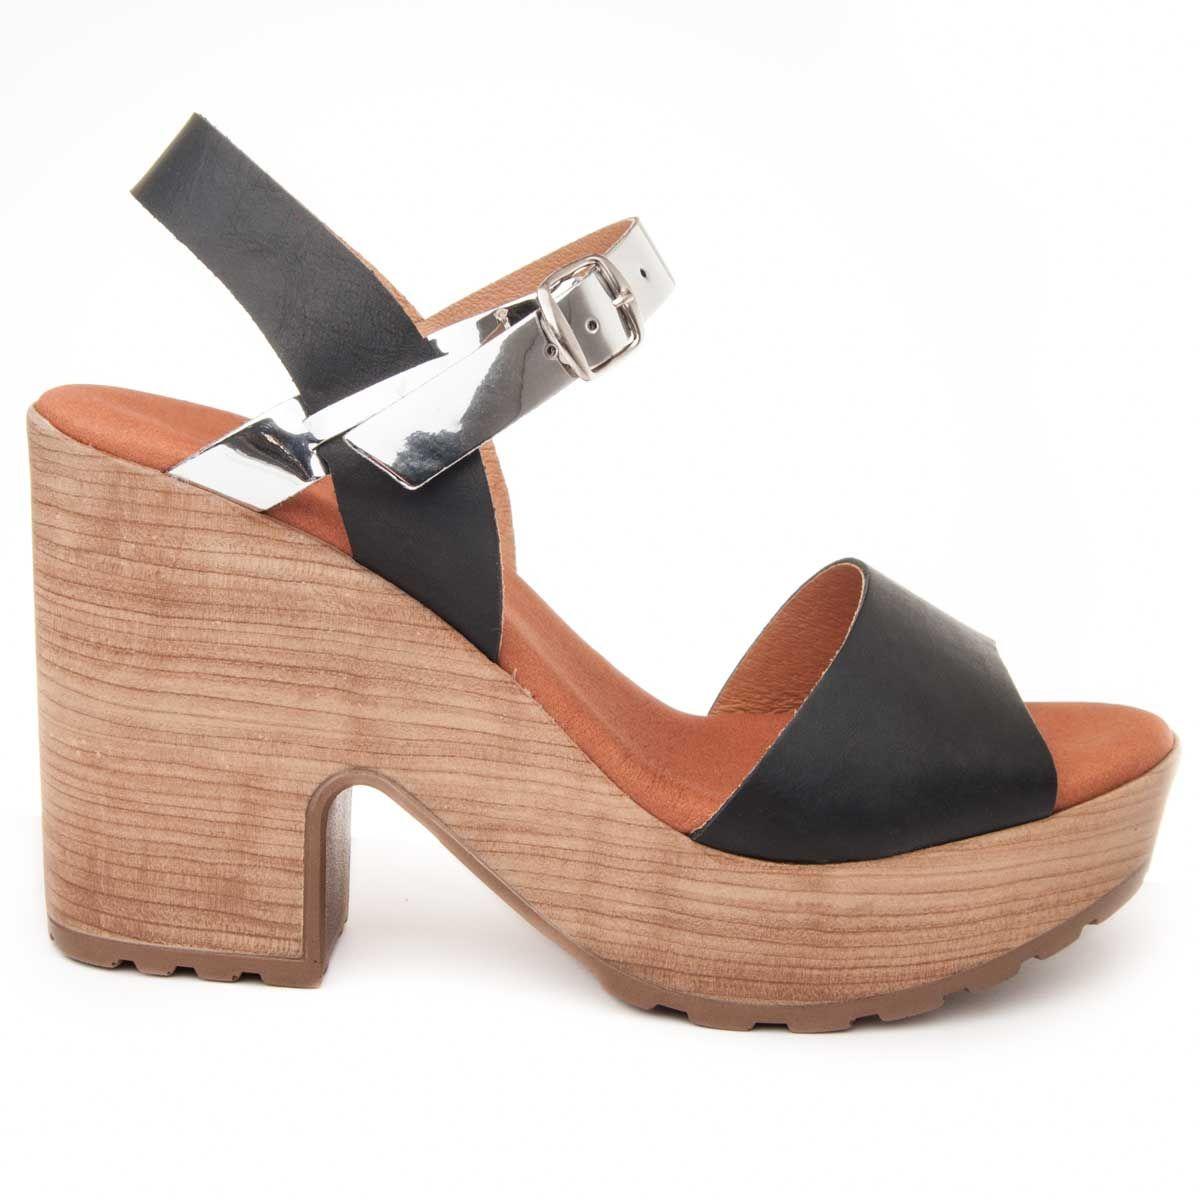 Purapiel Heel Sandal in Black